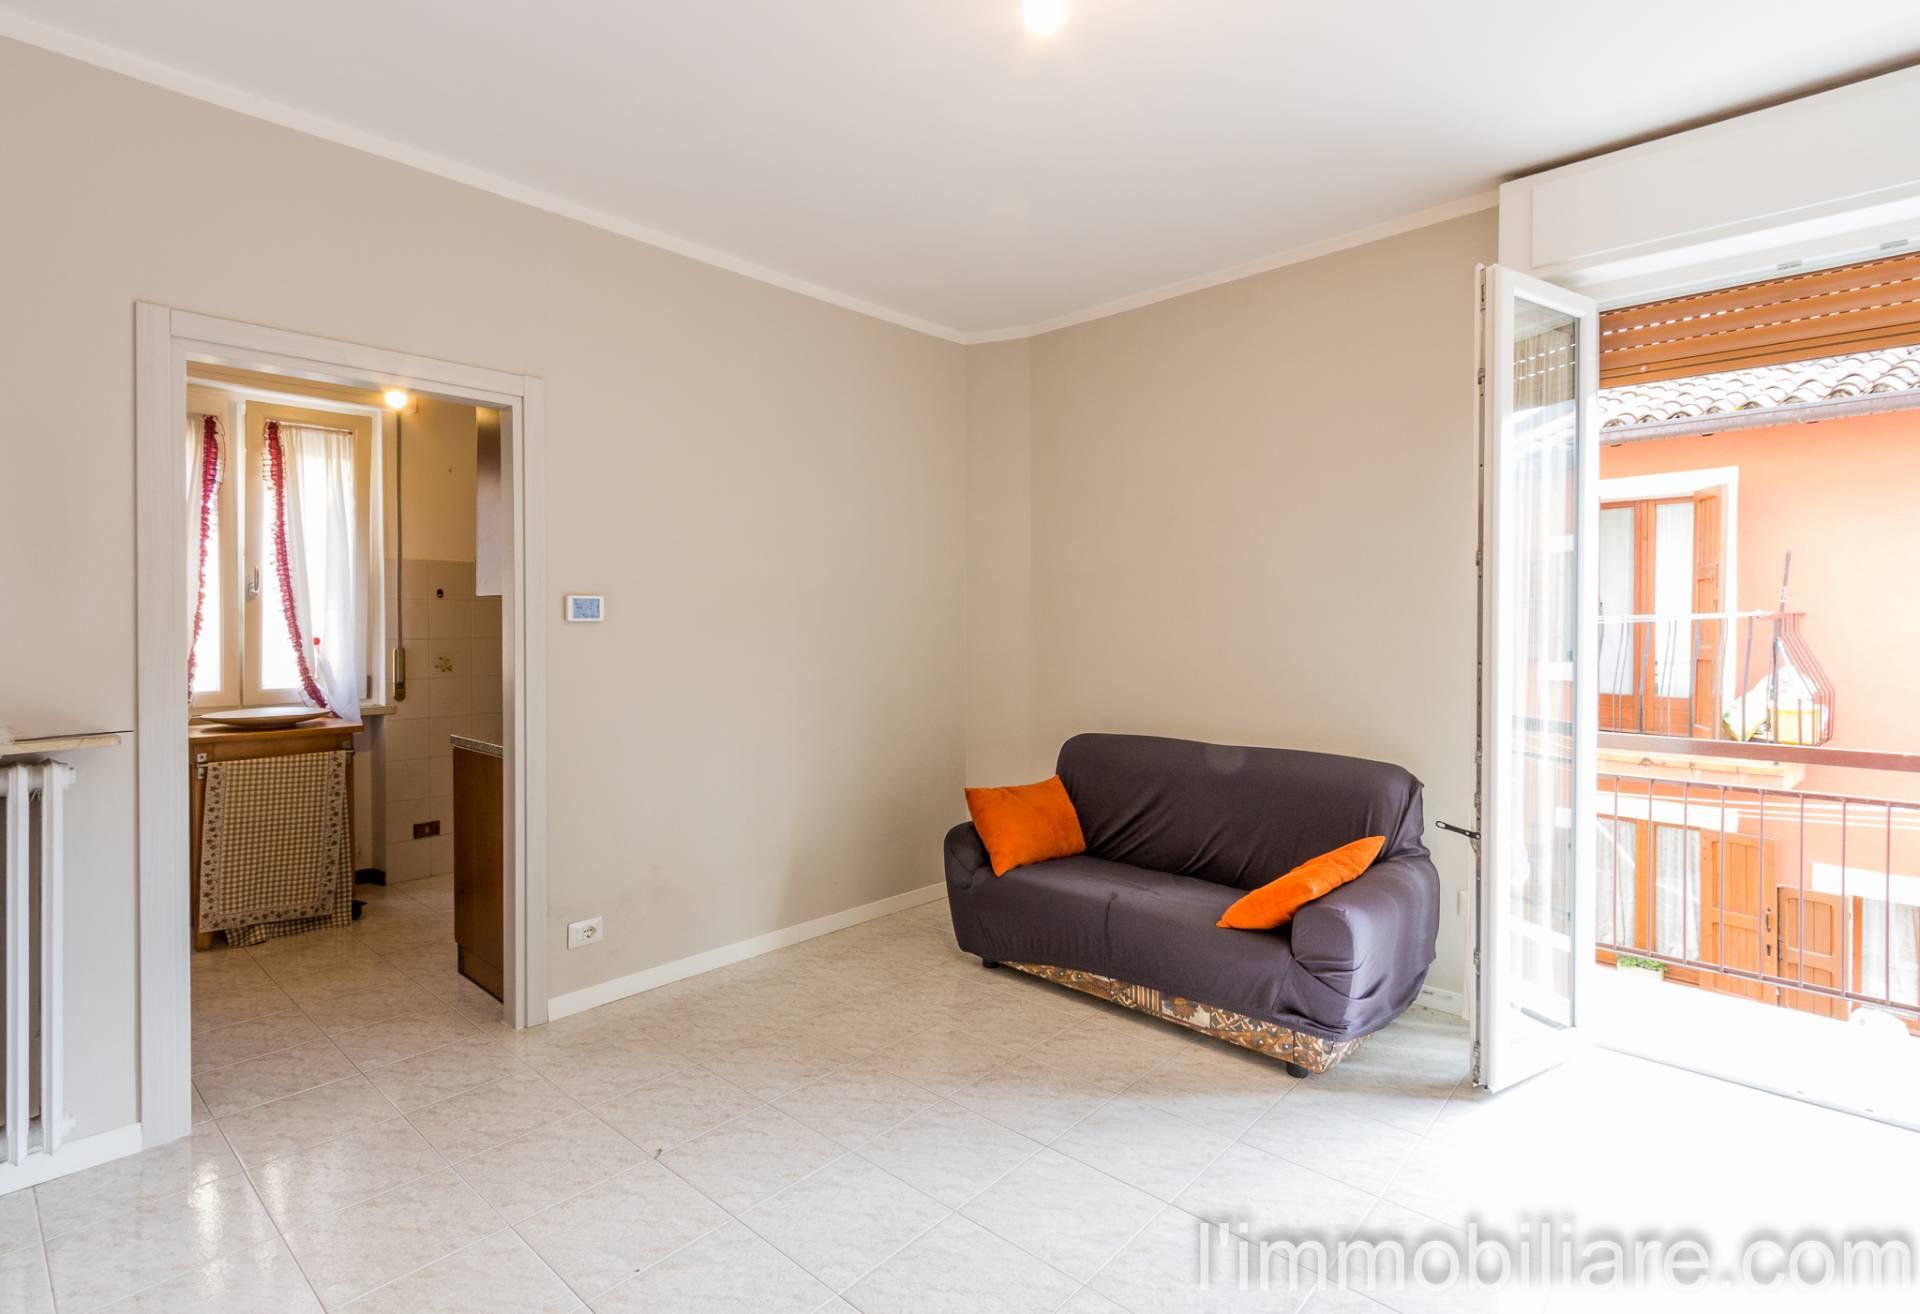 Appartamento a Verona in Vendita